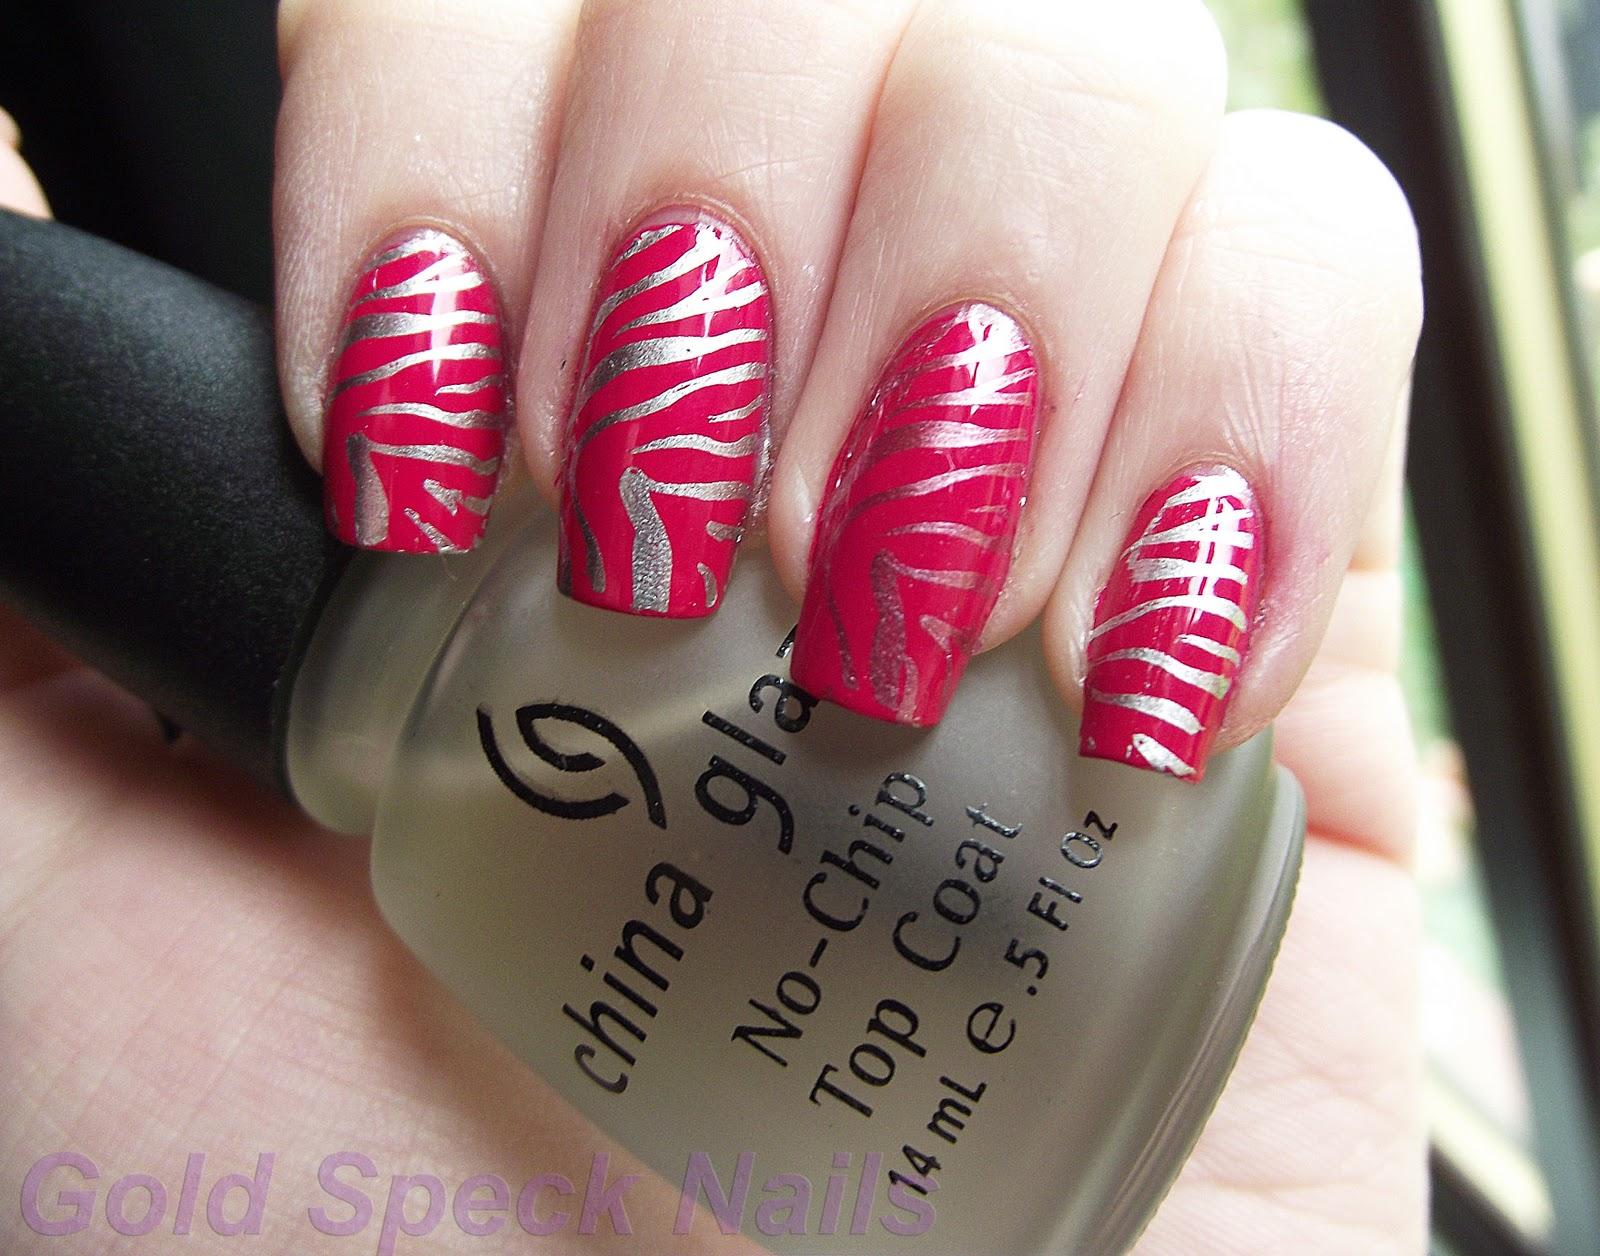 Gold Speck Nails P2 Pink It Up Chrome Zebra Konad